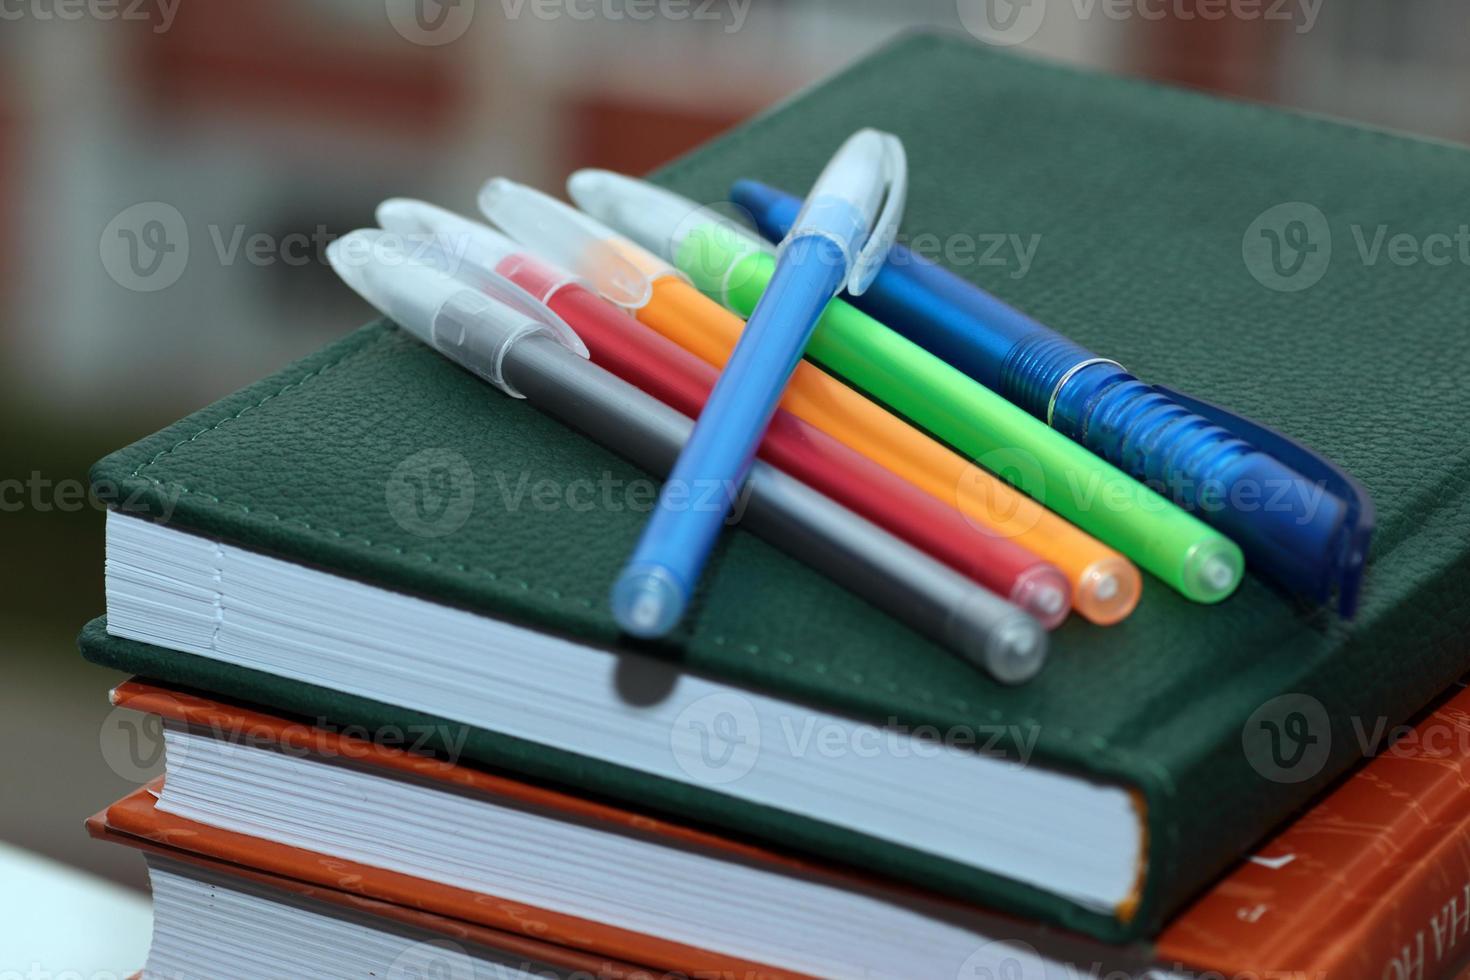 stylo crayon étude manuels photo